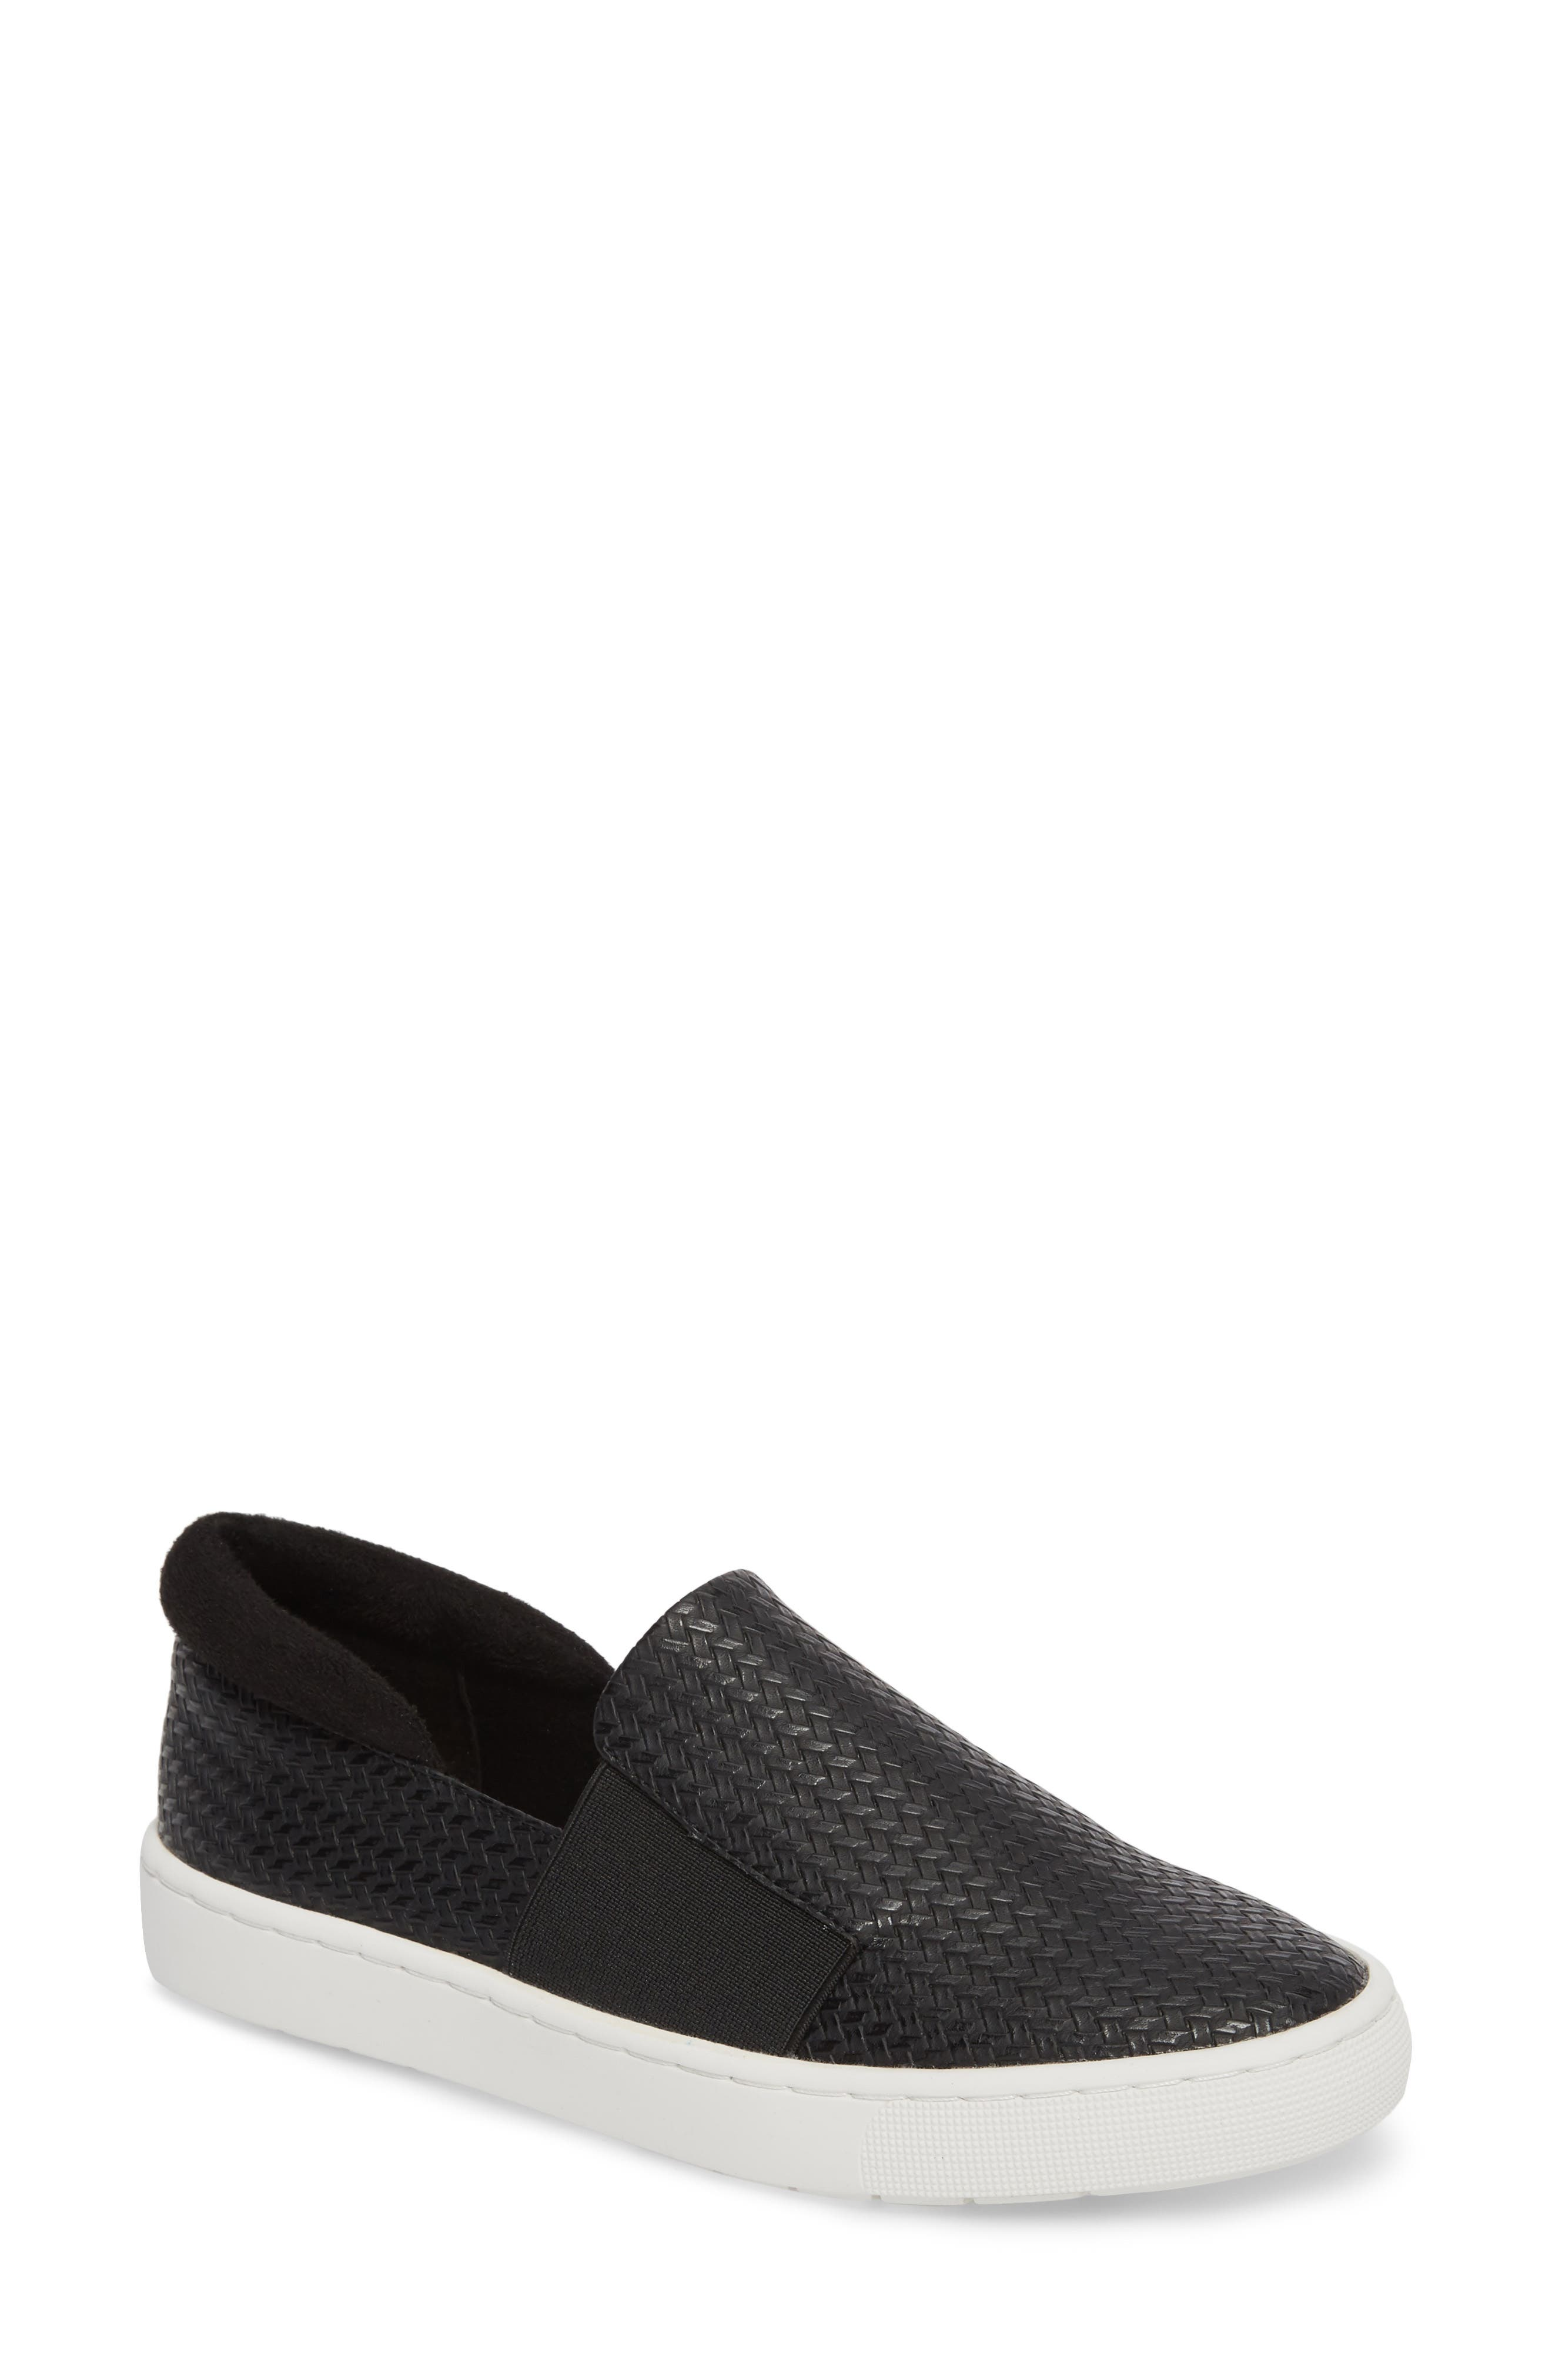 BELLA VITA, Ramp II Slip-On Sneaker, Main thumbnail 1, color, BLACK FABRIC